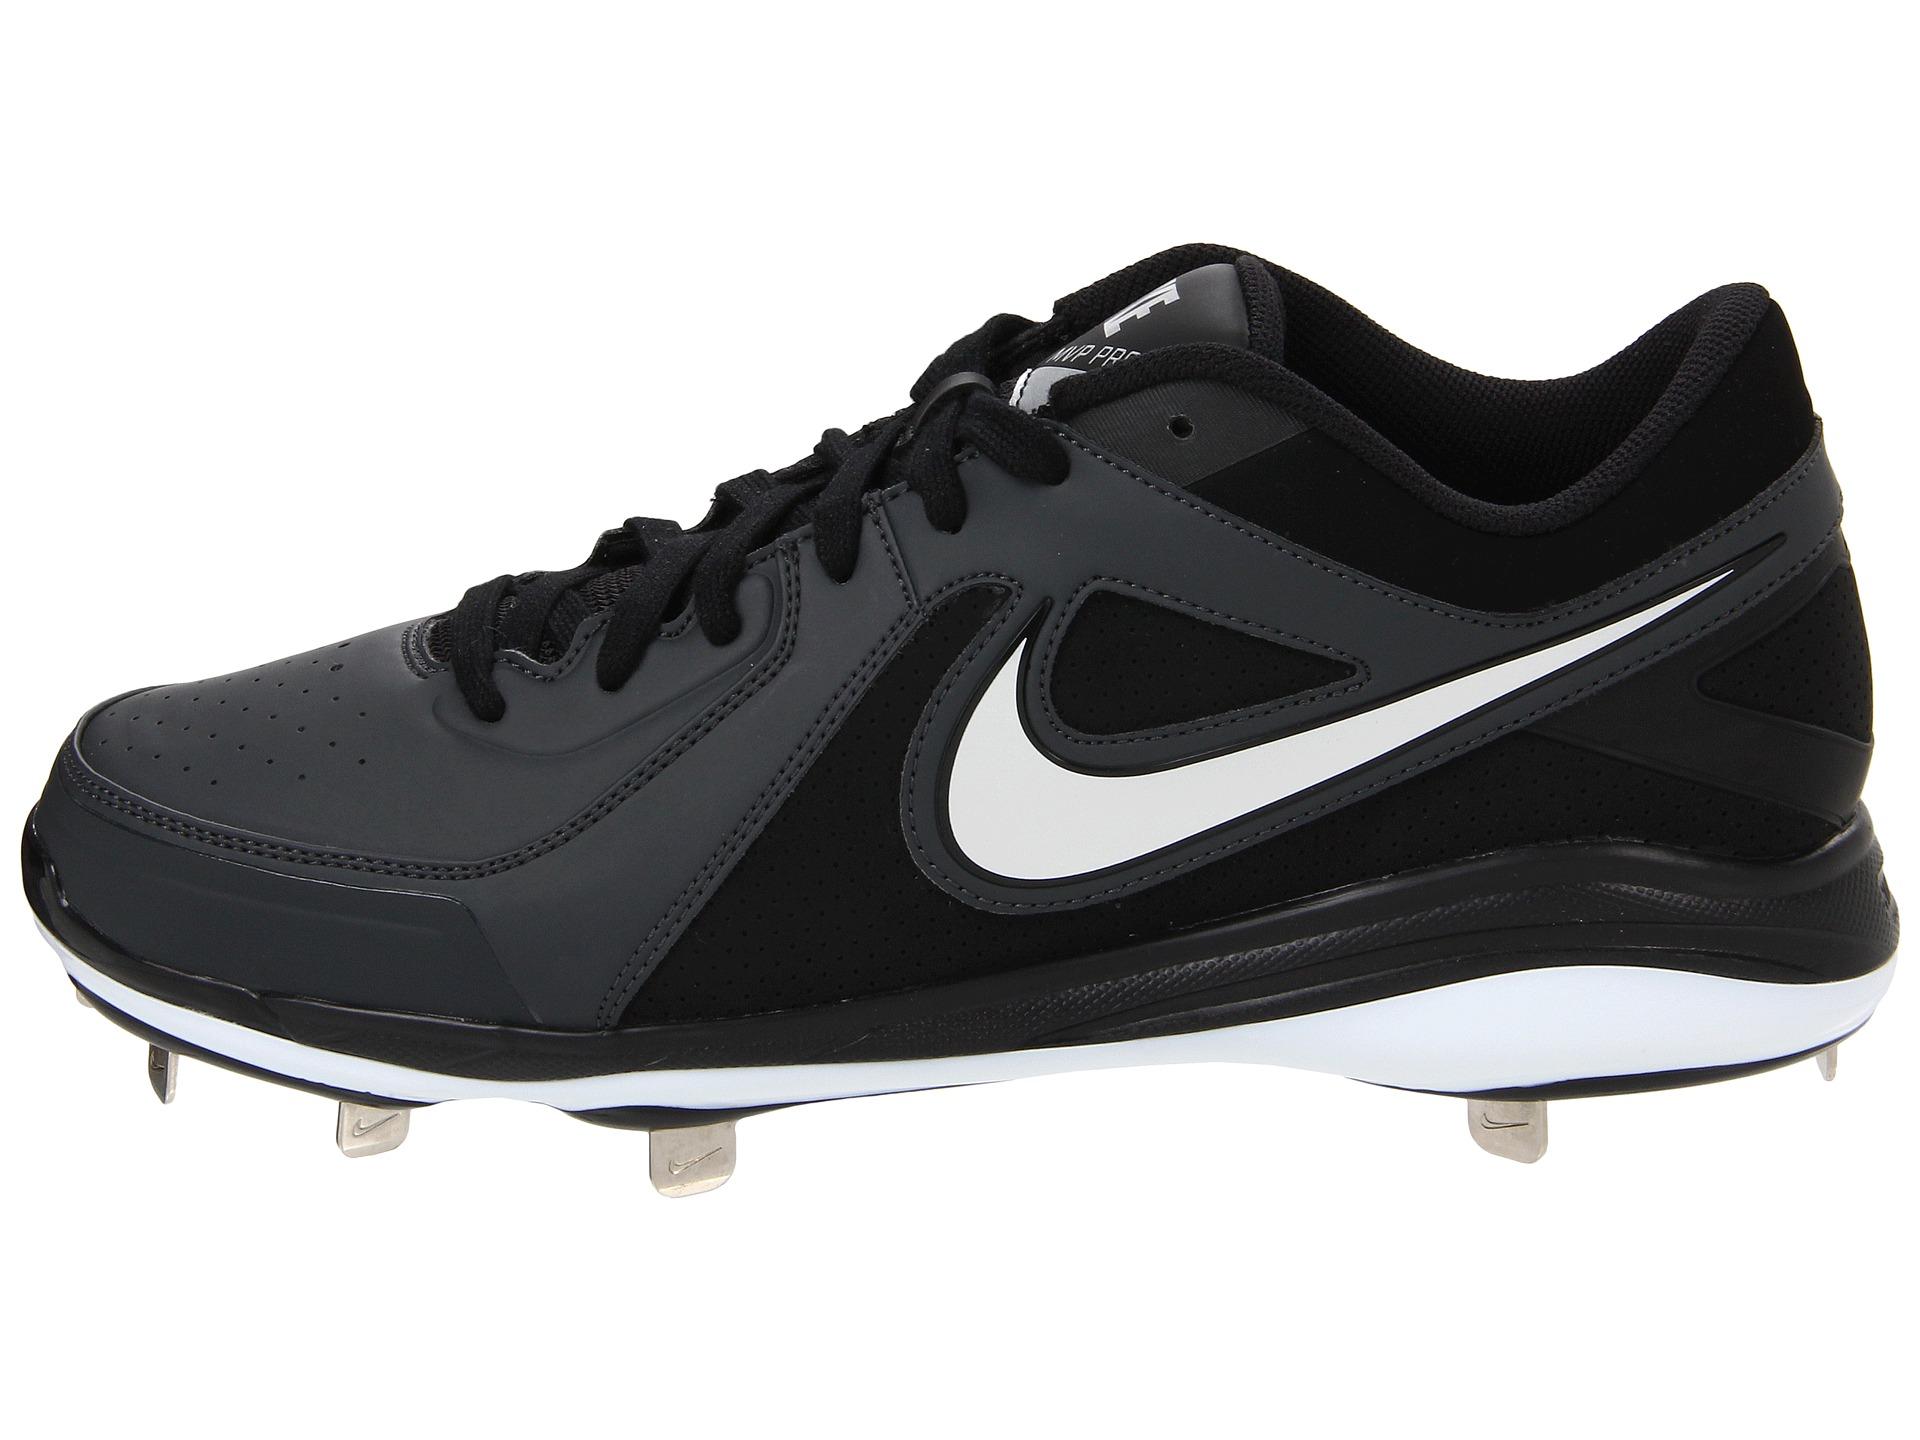 Nike Air MVP Pro Metal Baseball Cleats - American Football ...